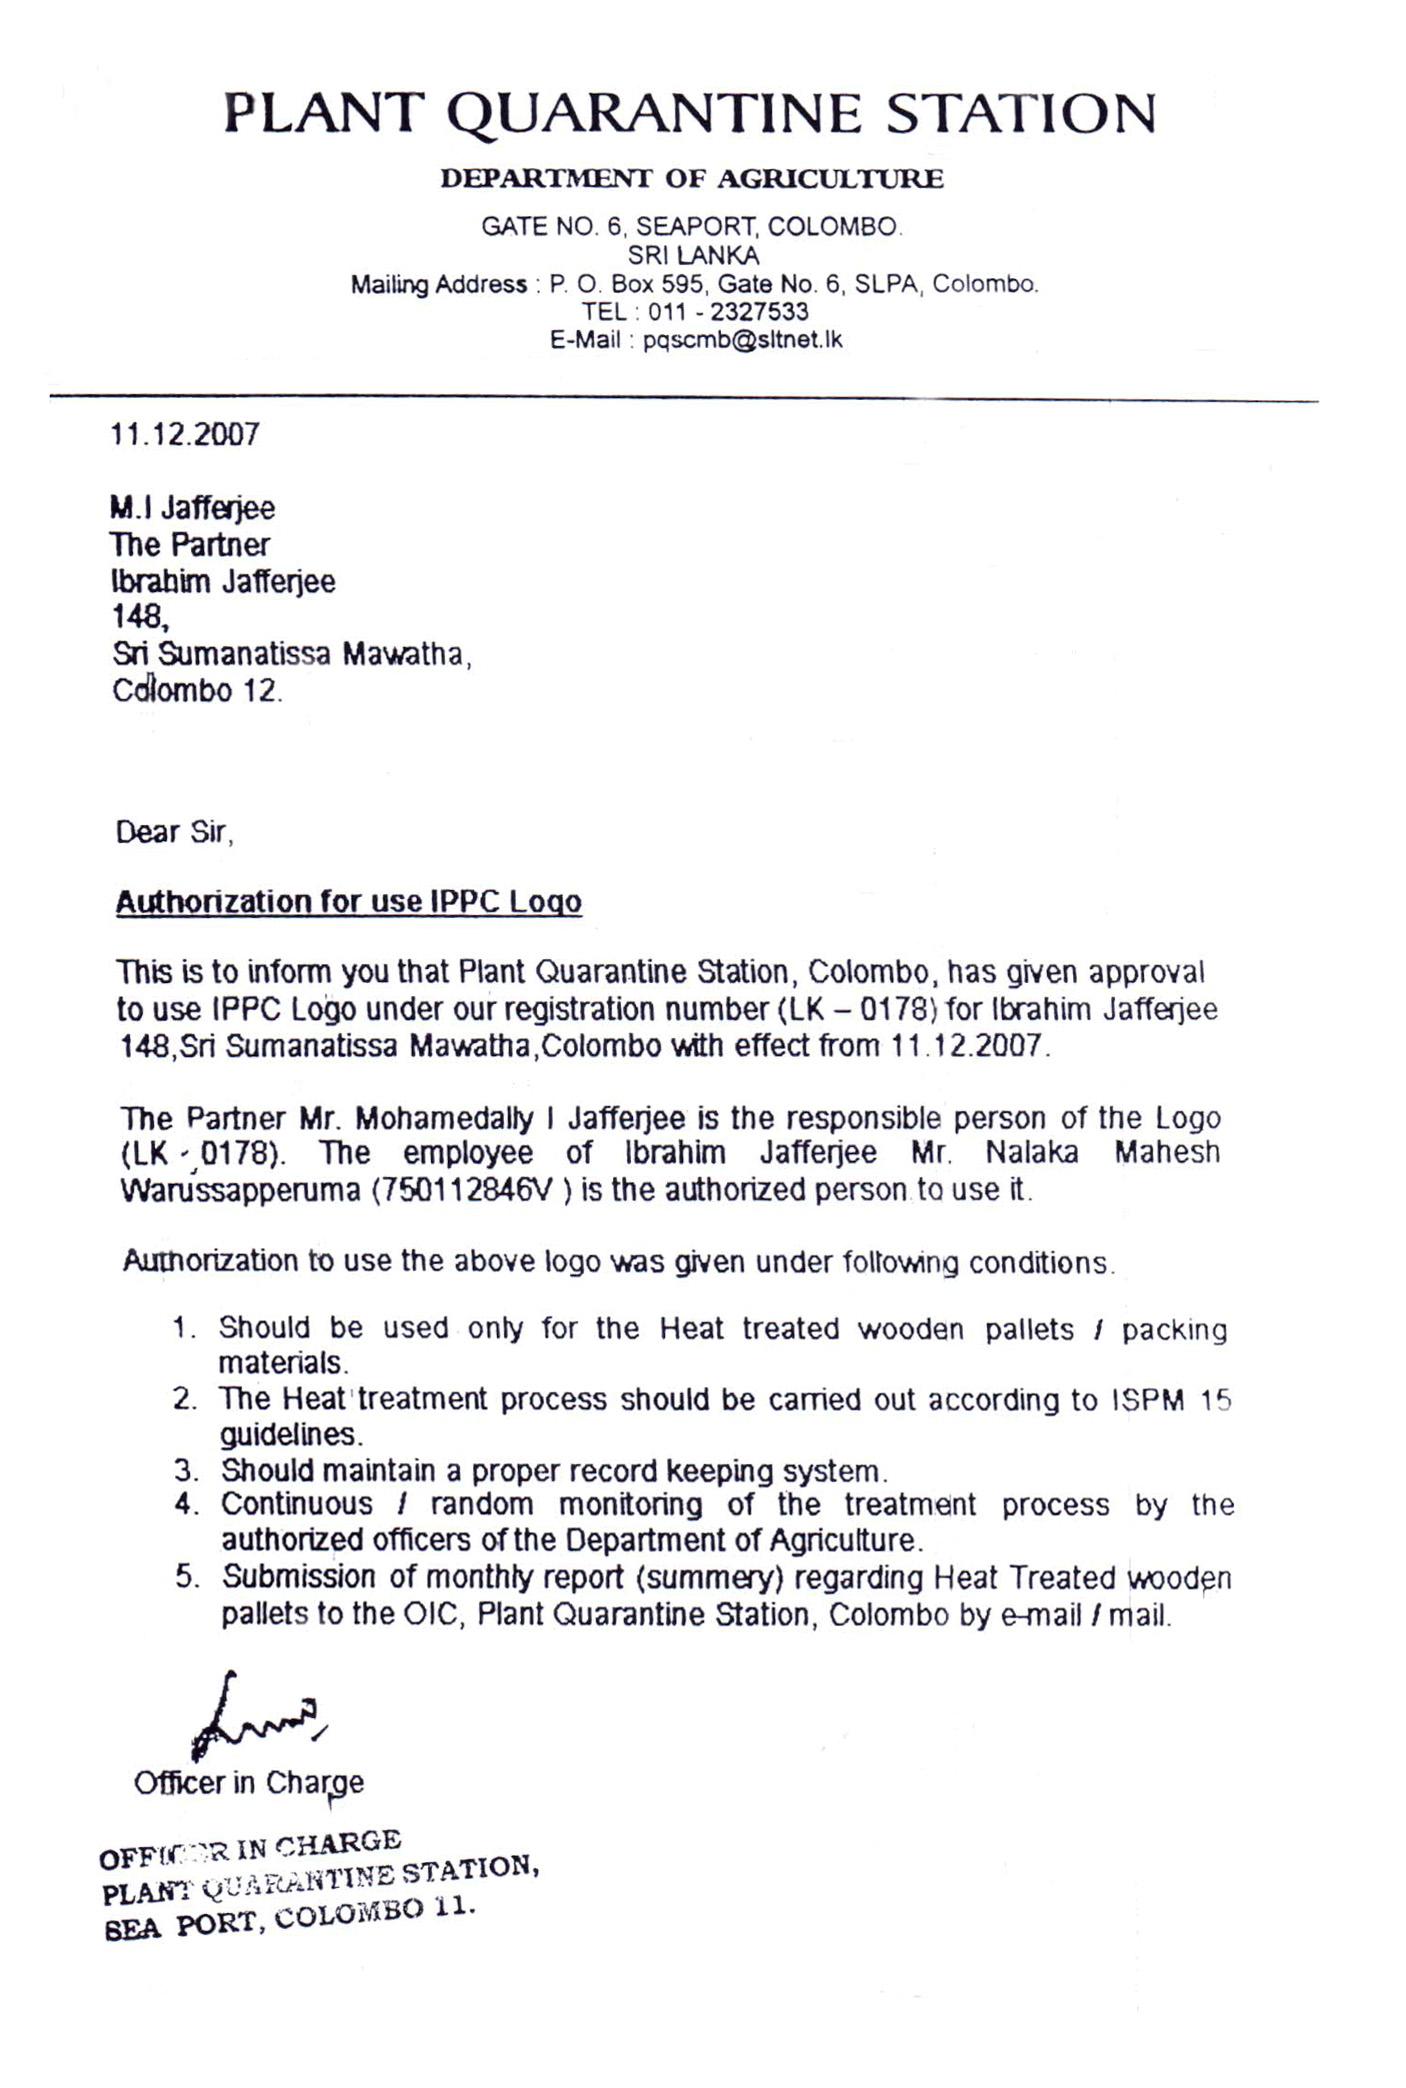 IPPC Certification